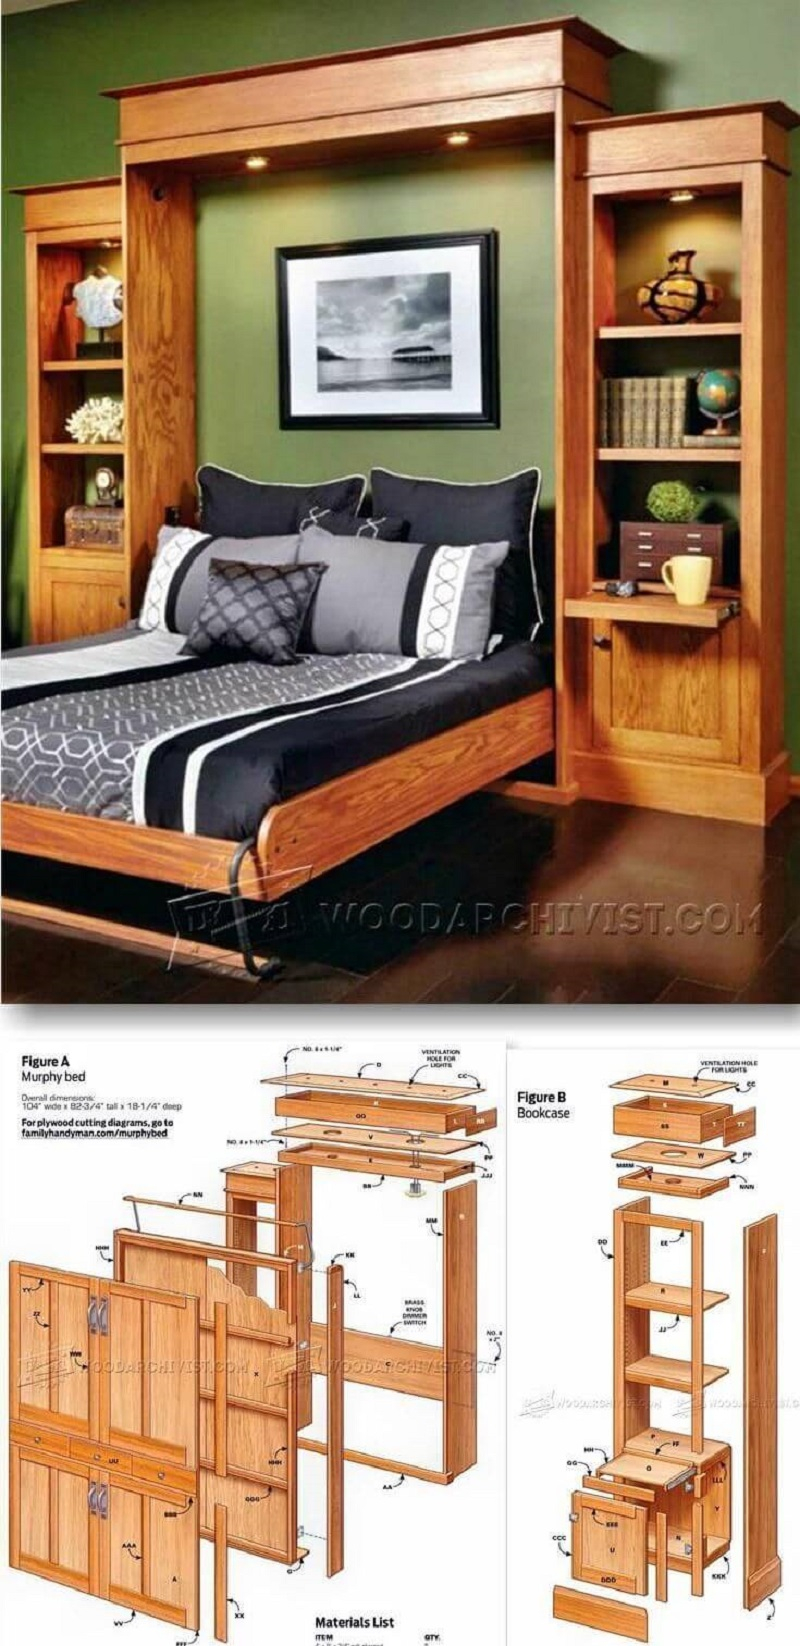 A wooden murphy bed within a bookshelf